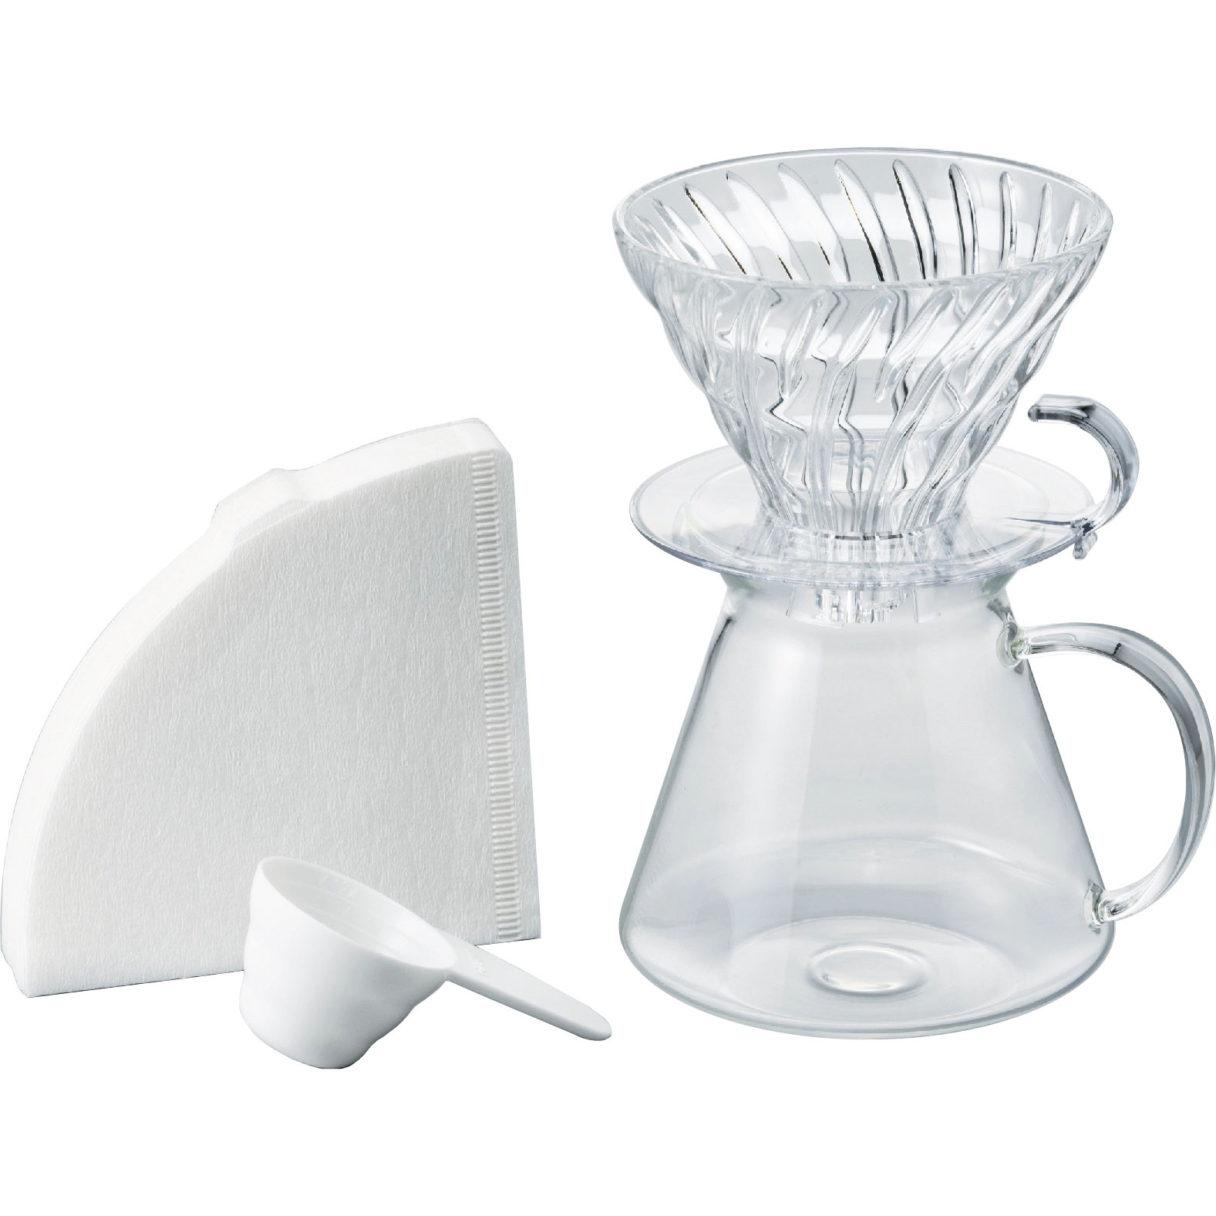 Simply Hario V60 Glass Kit